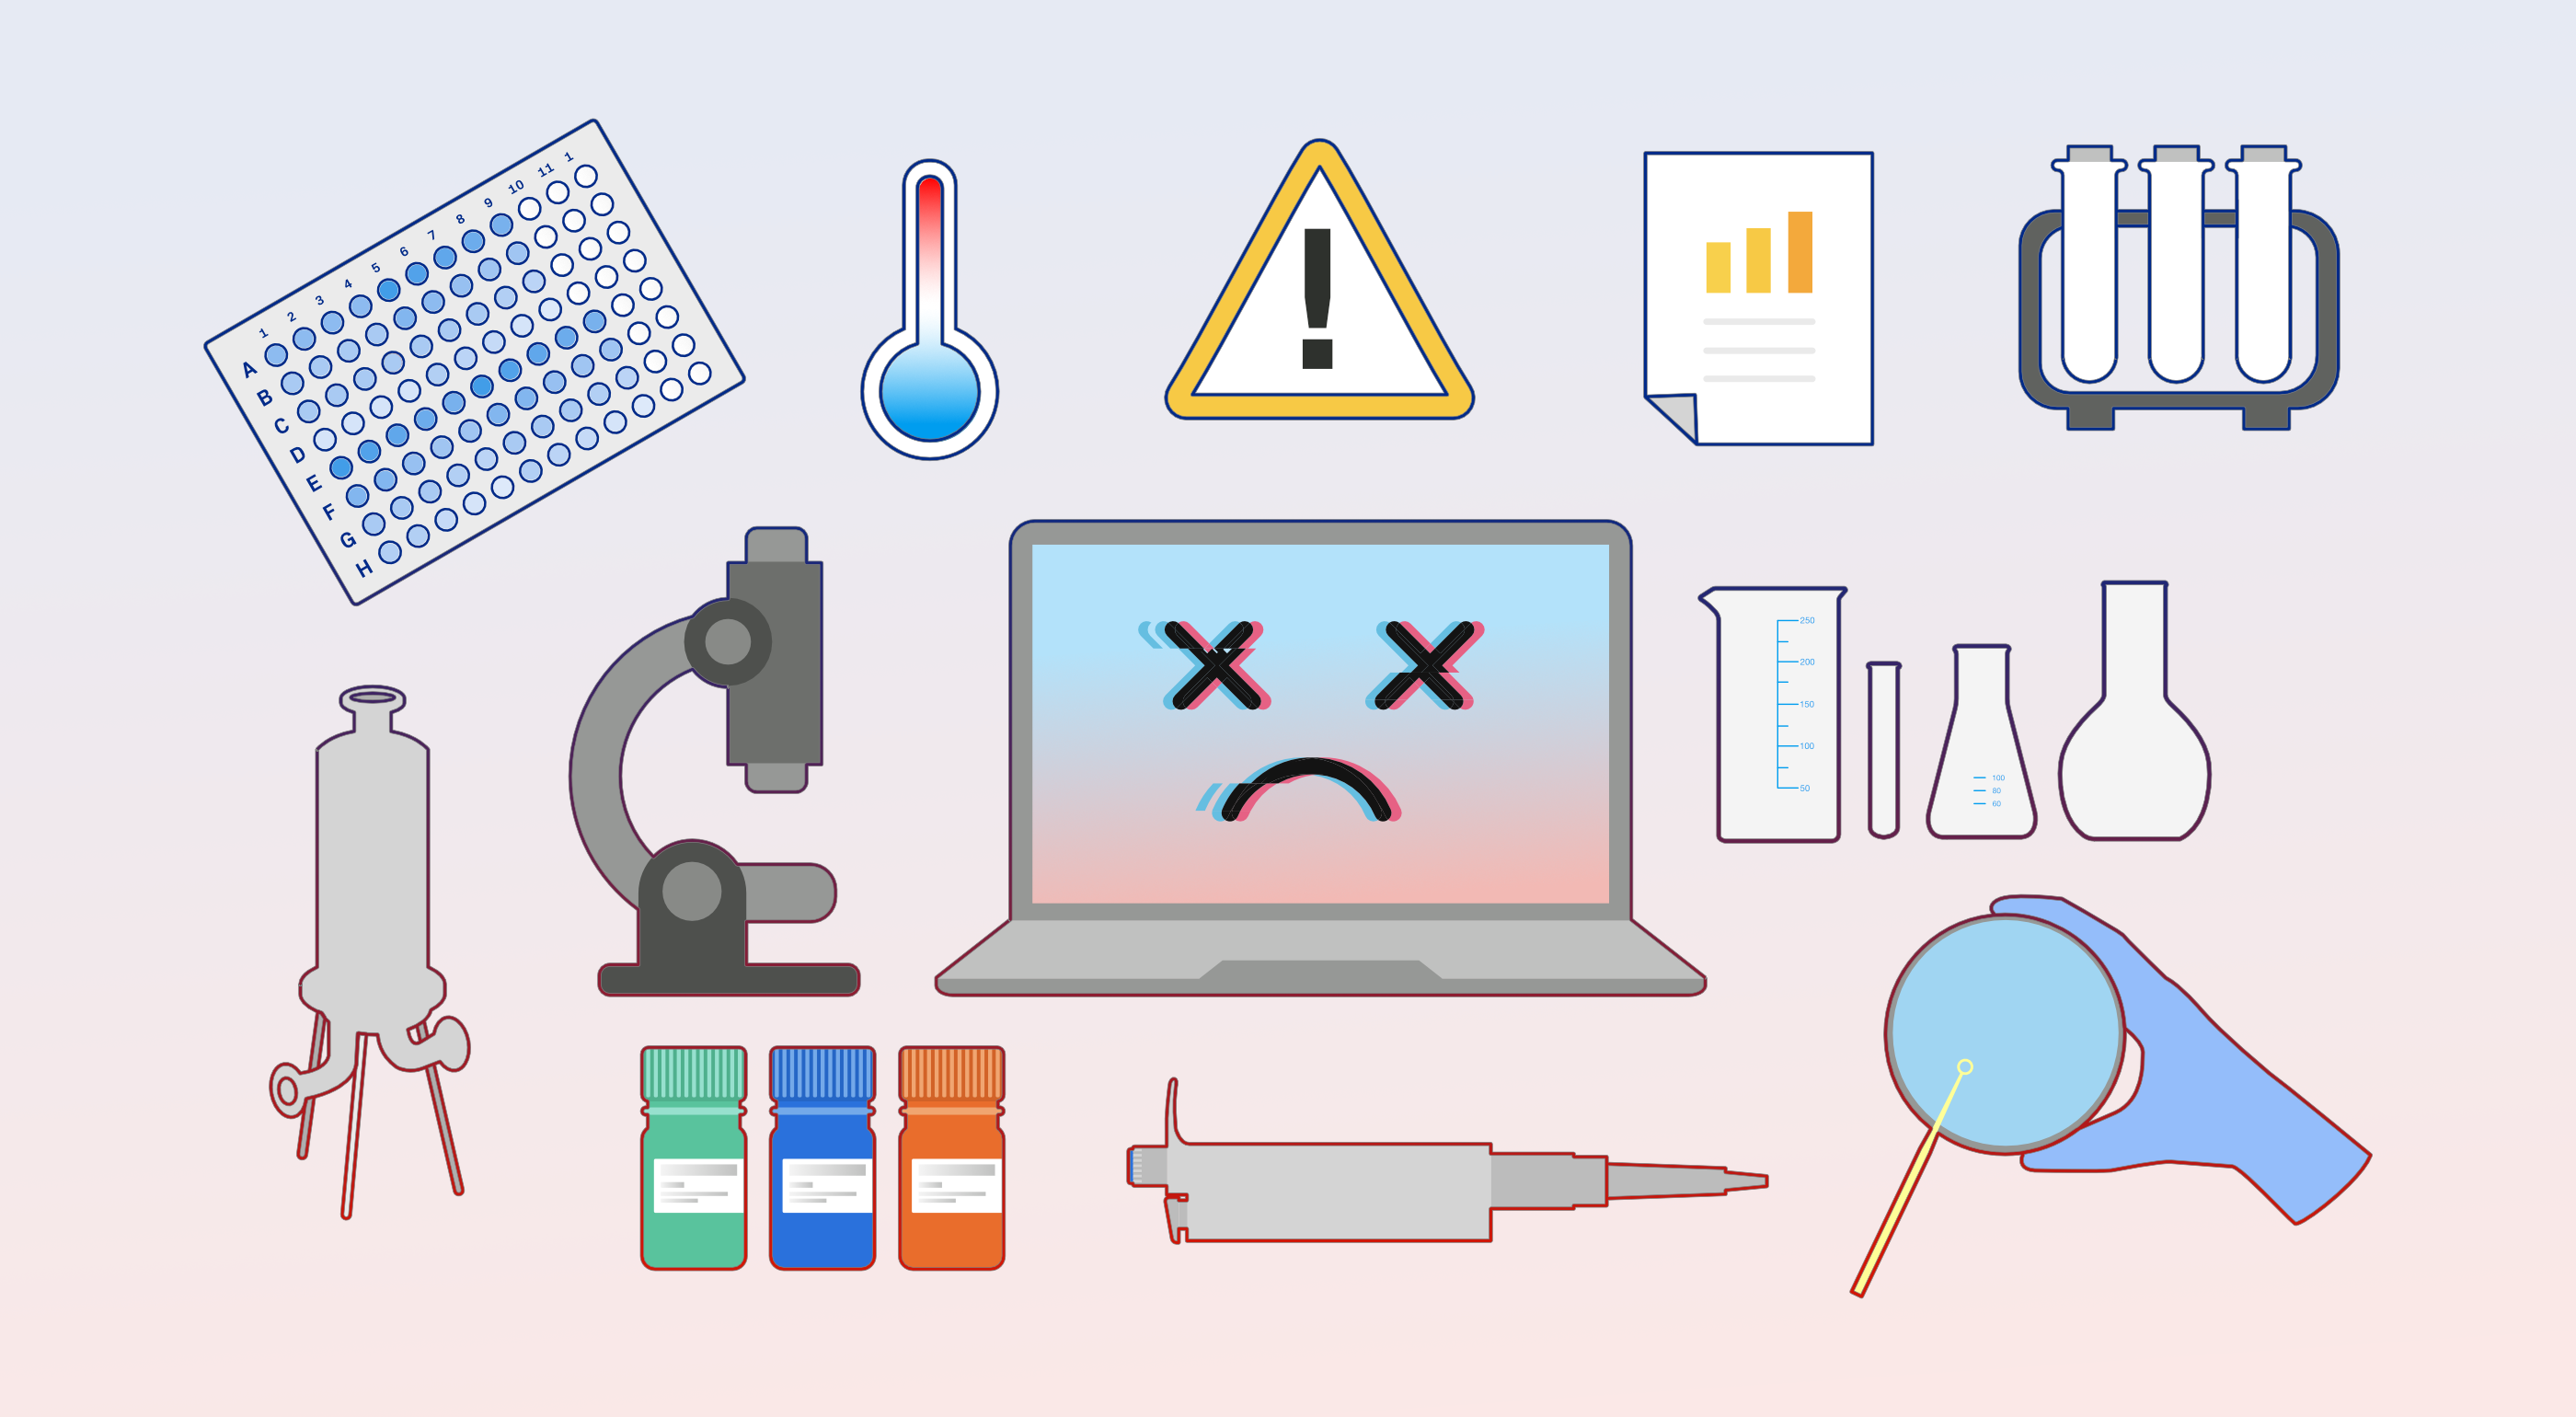 Common lab equipment malfunctions